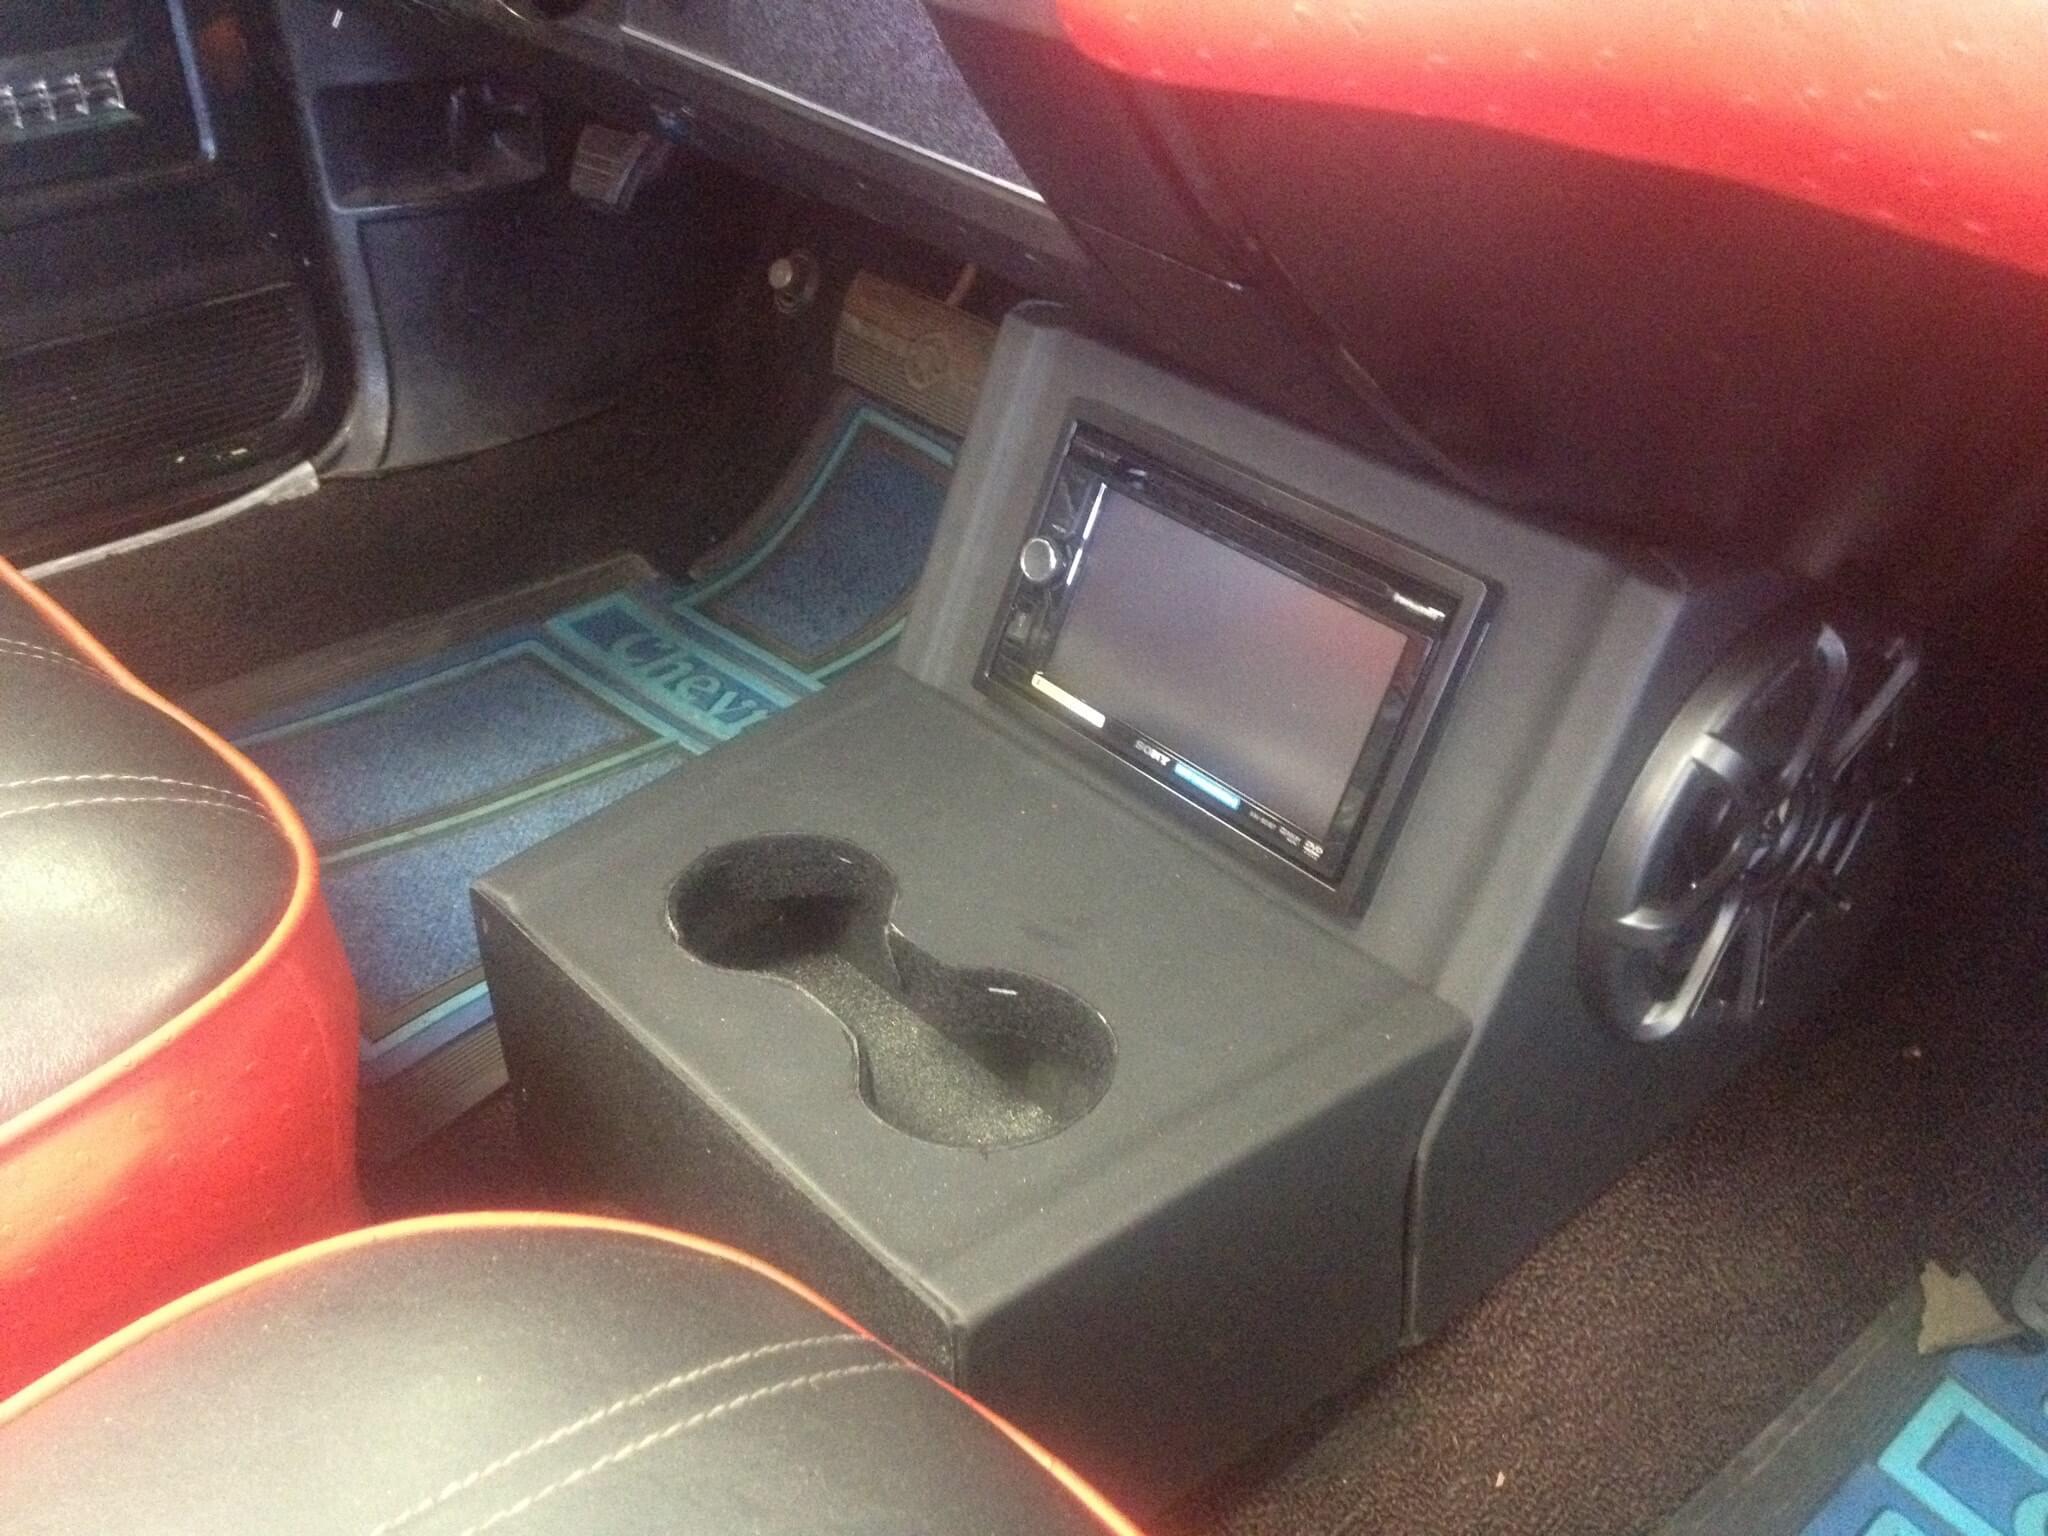 Sick custom car audio and car video at Stereo Depot